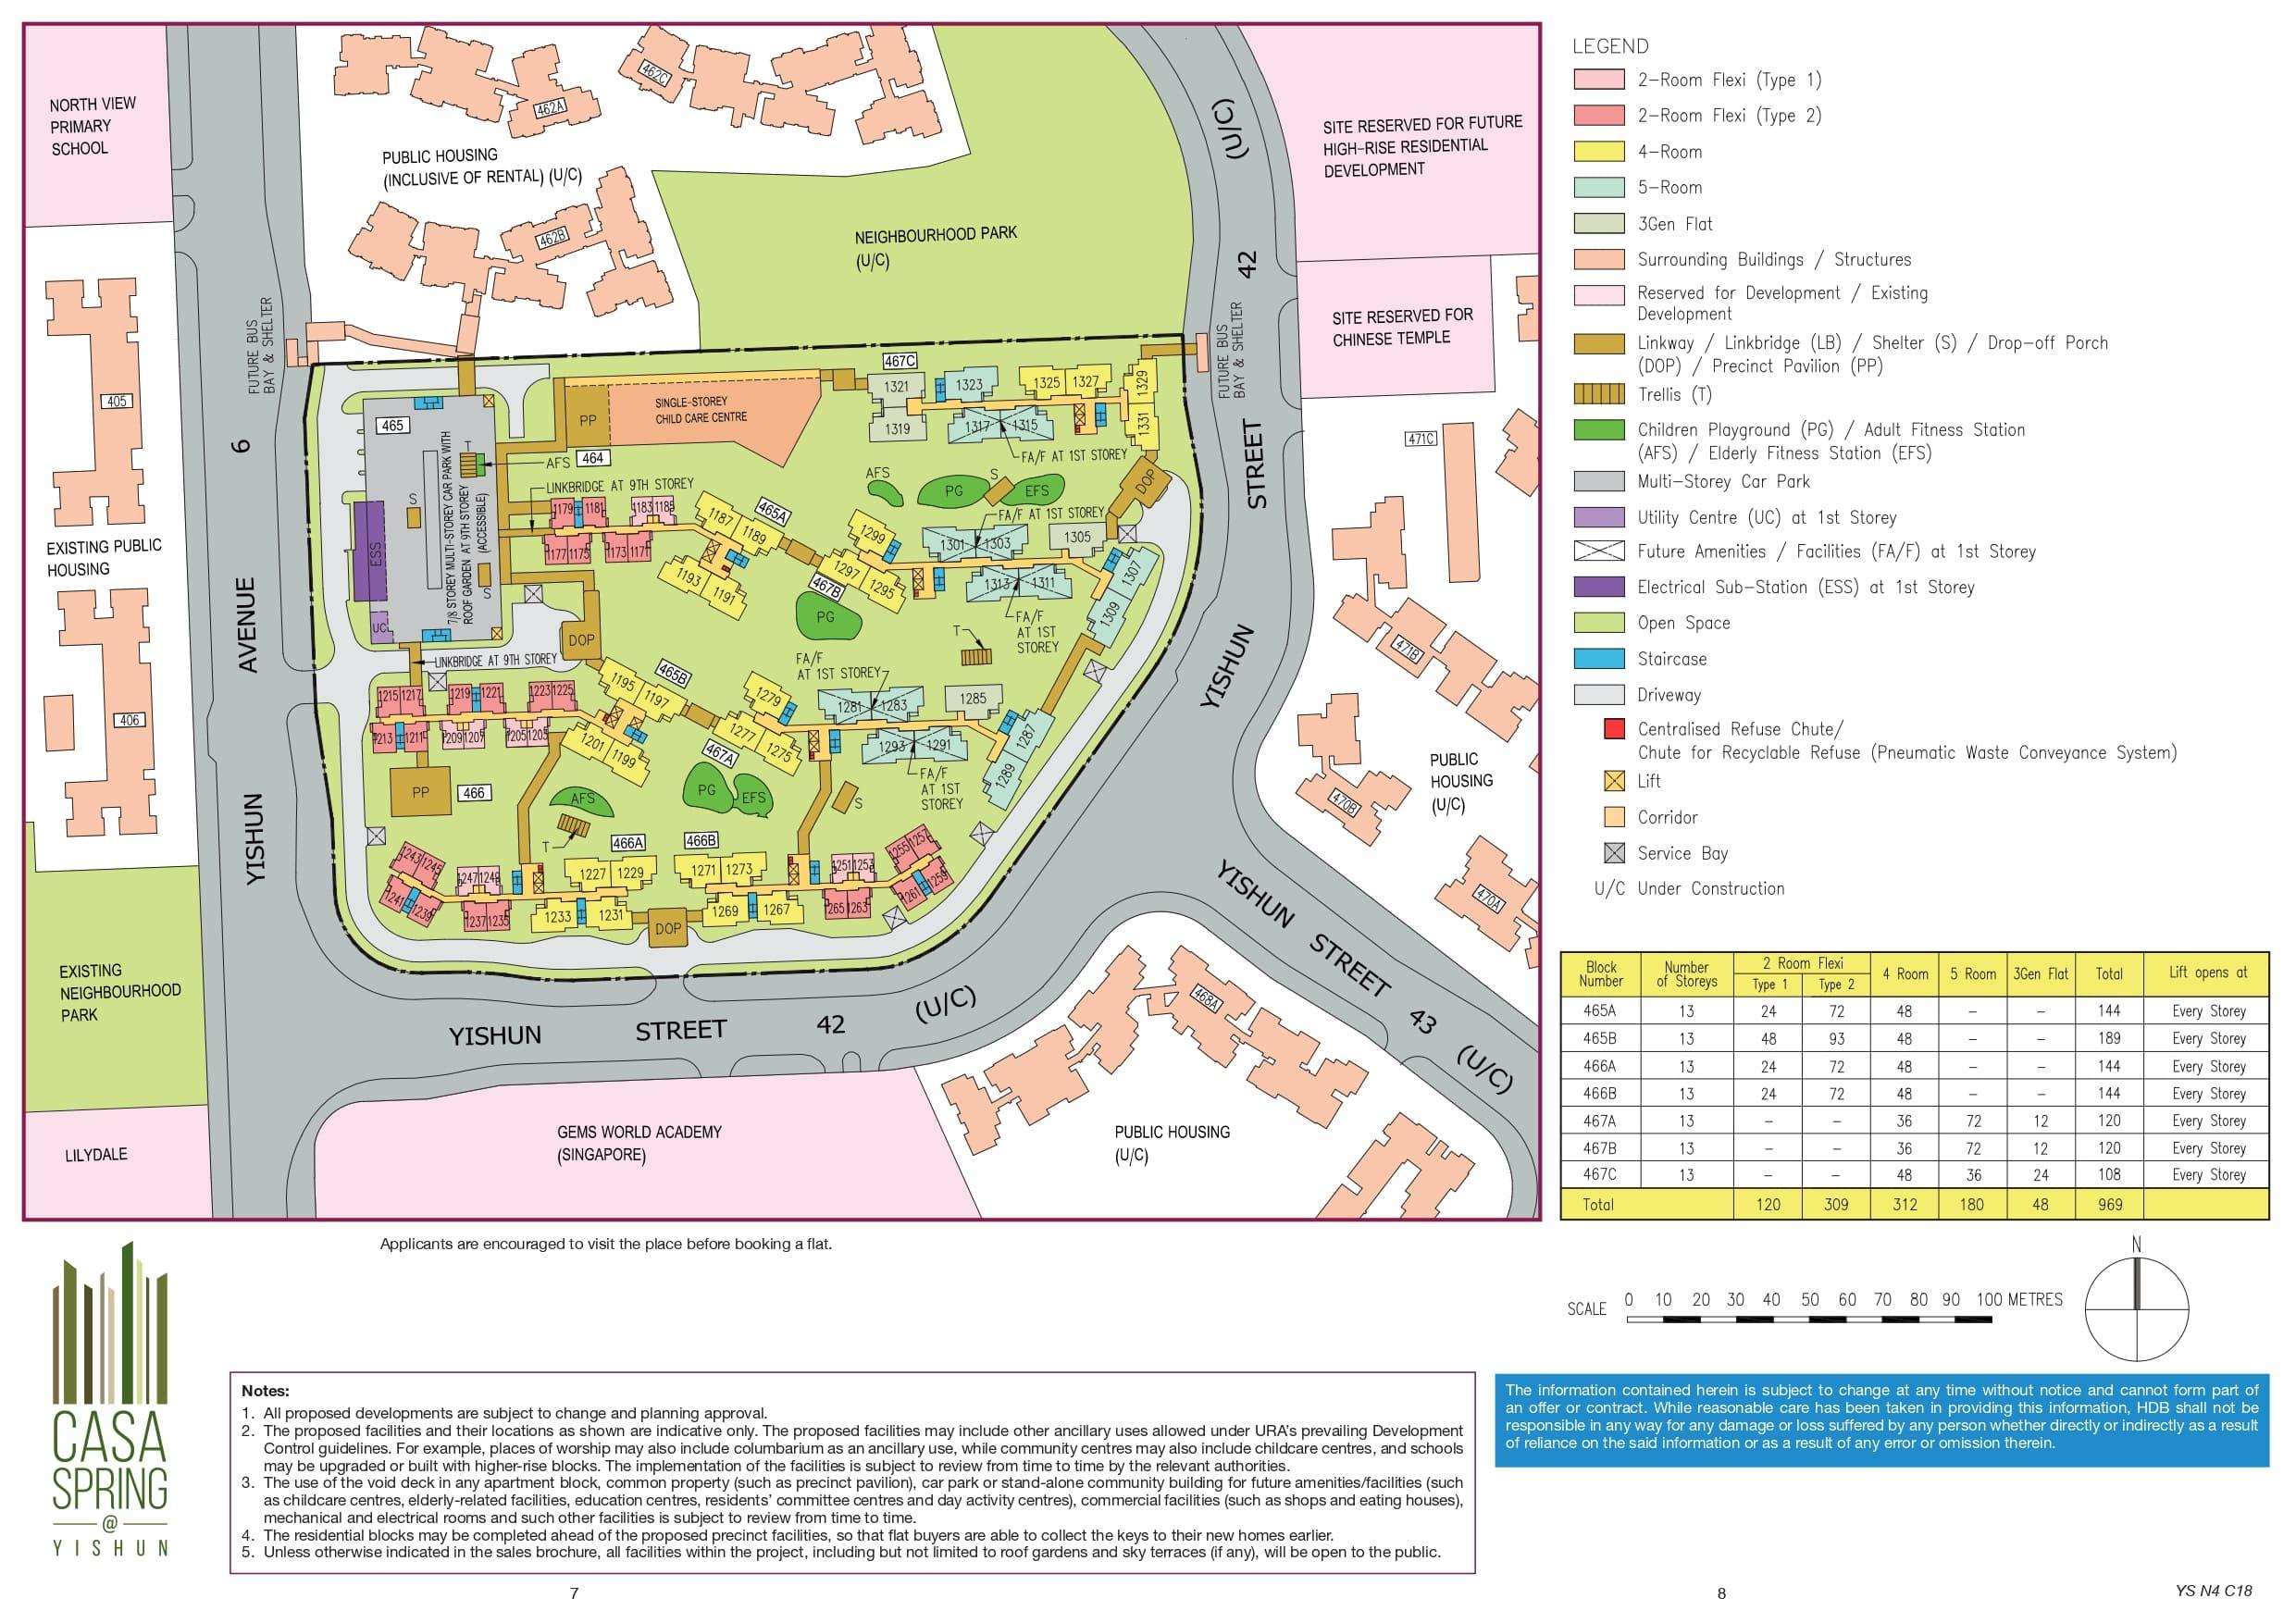 Casa Spring @ Yishun Site Plan